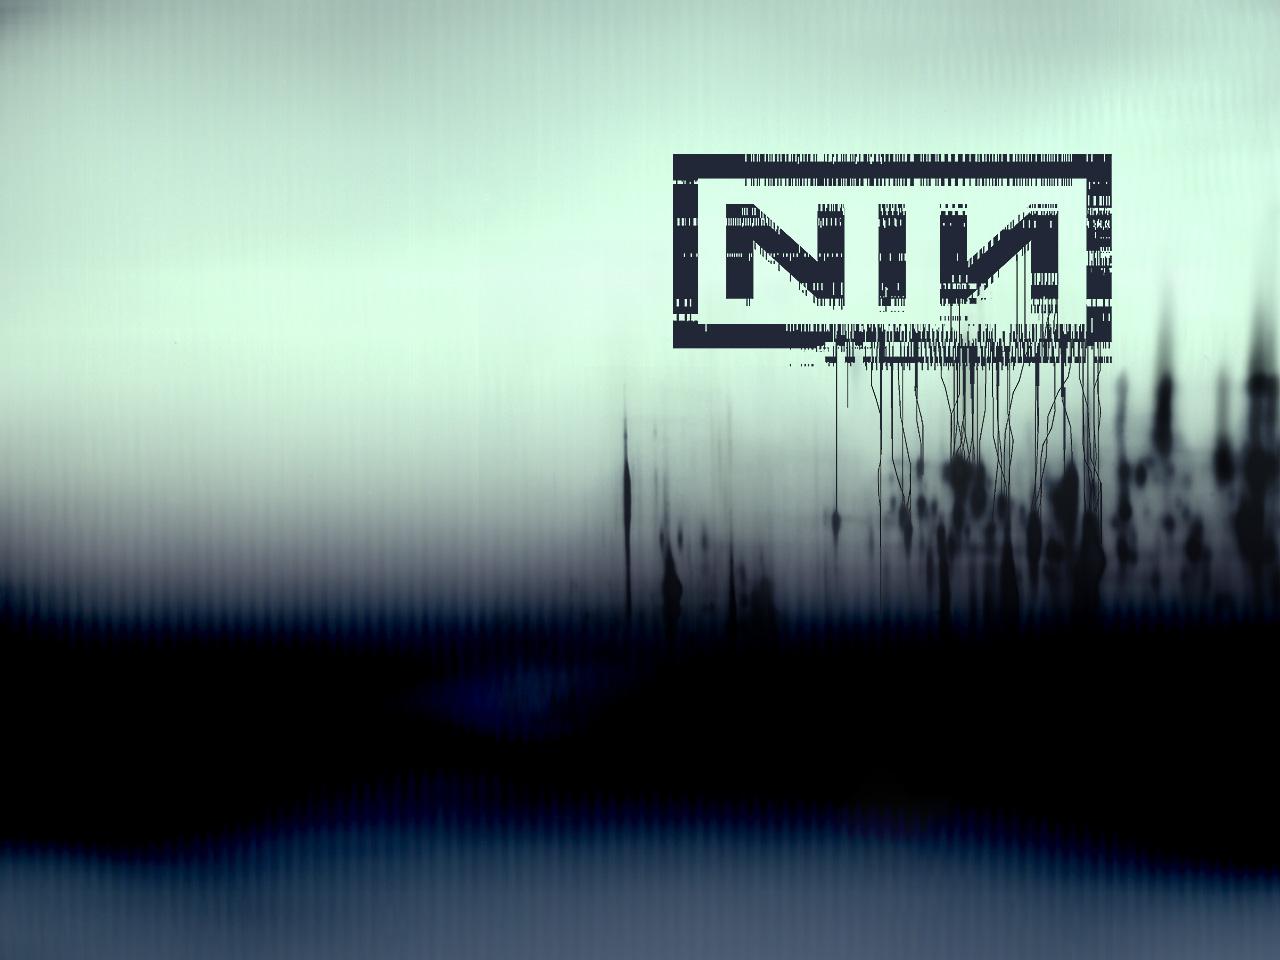 NIN - Ghosts I-IV Album